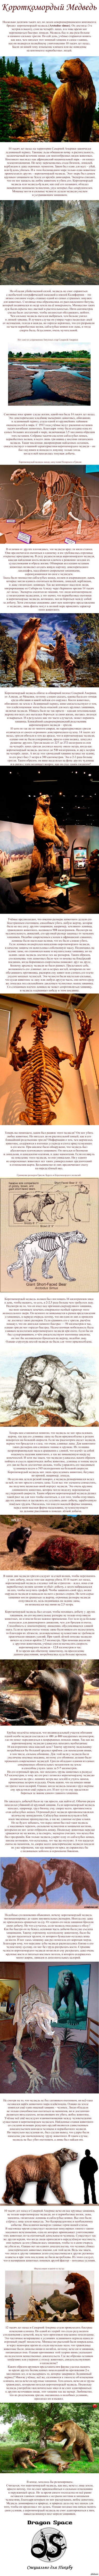 Вымерший гигант: Короткомордый Медведь. длина: 600х15640